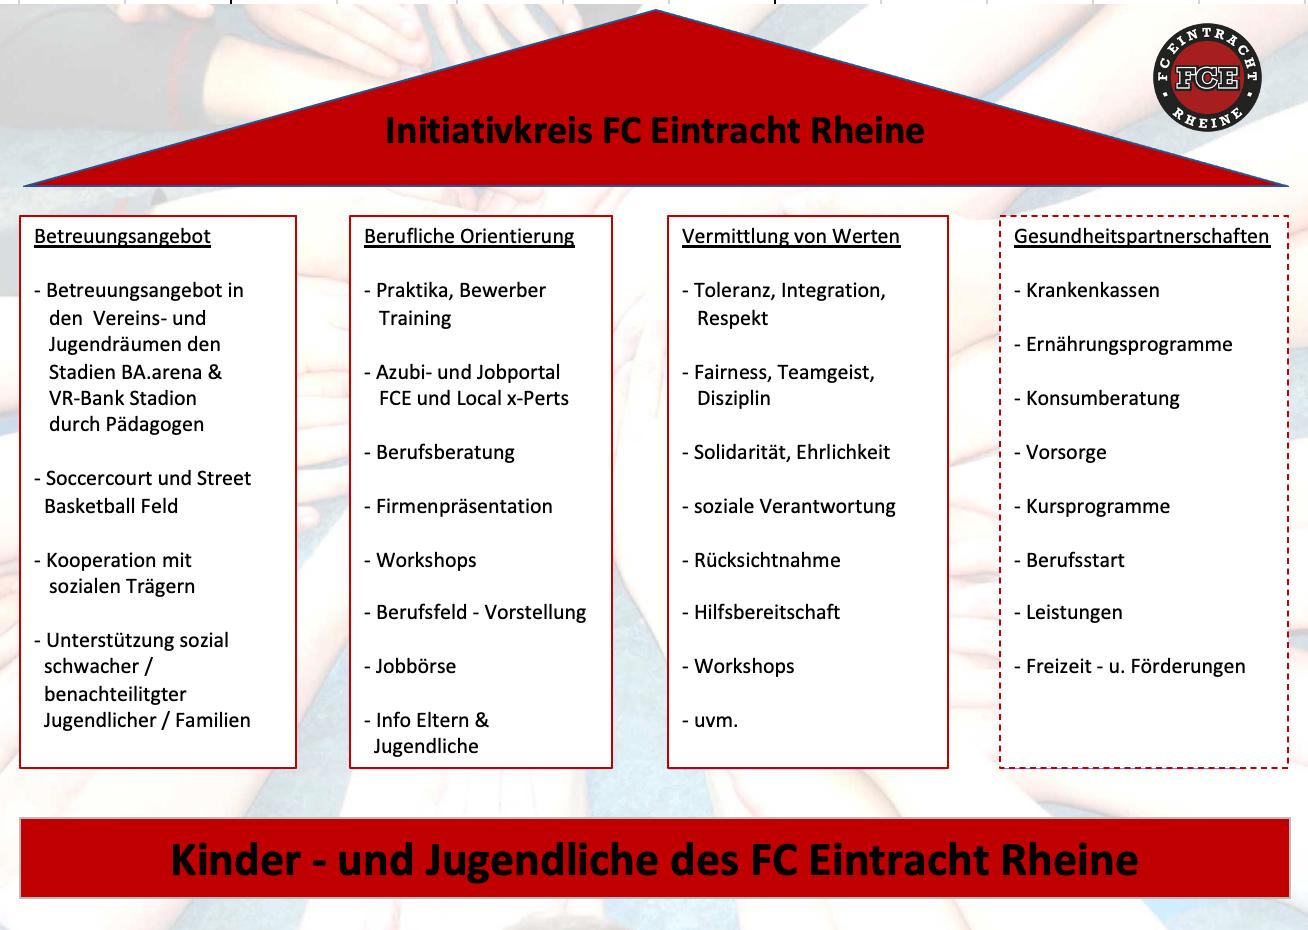 Initiativkreis FCE V1